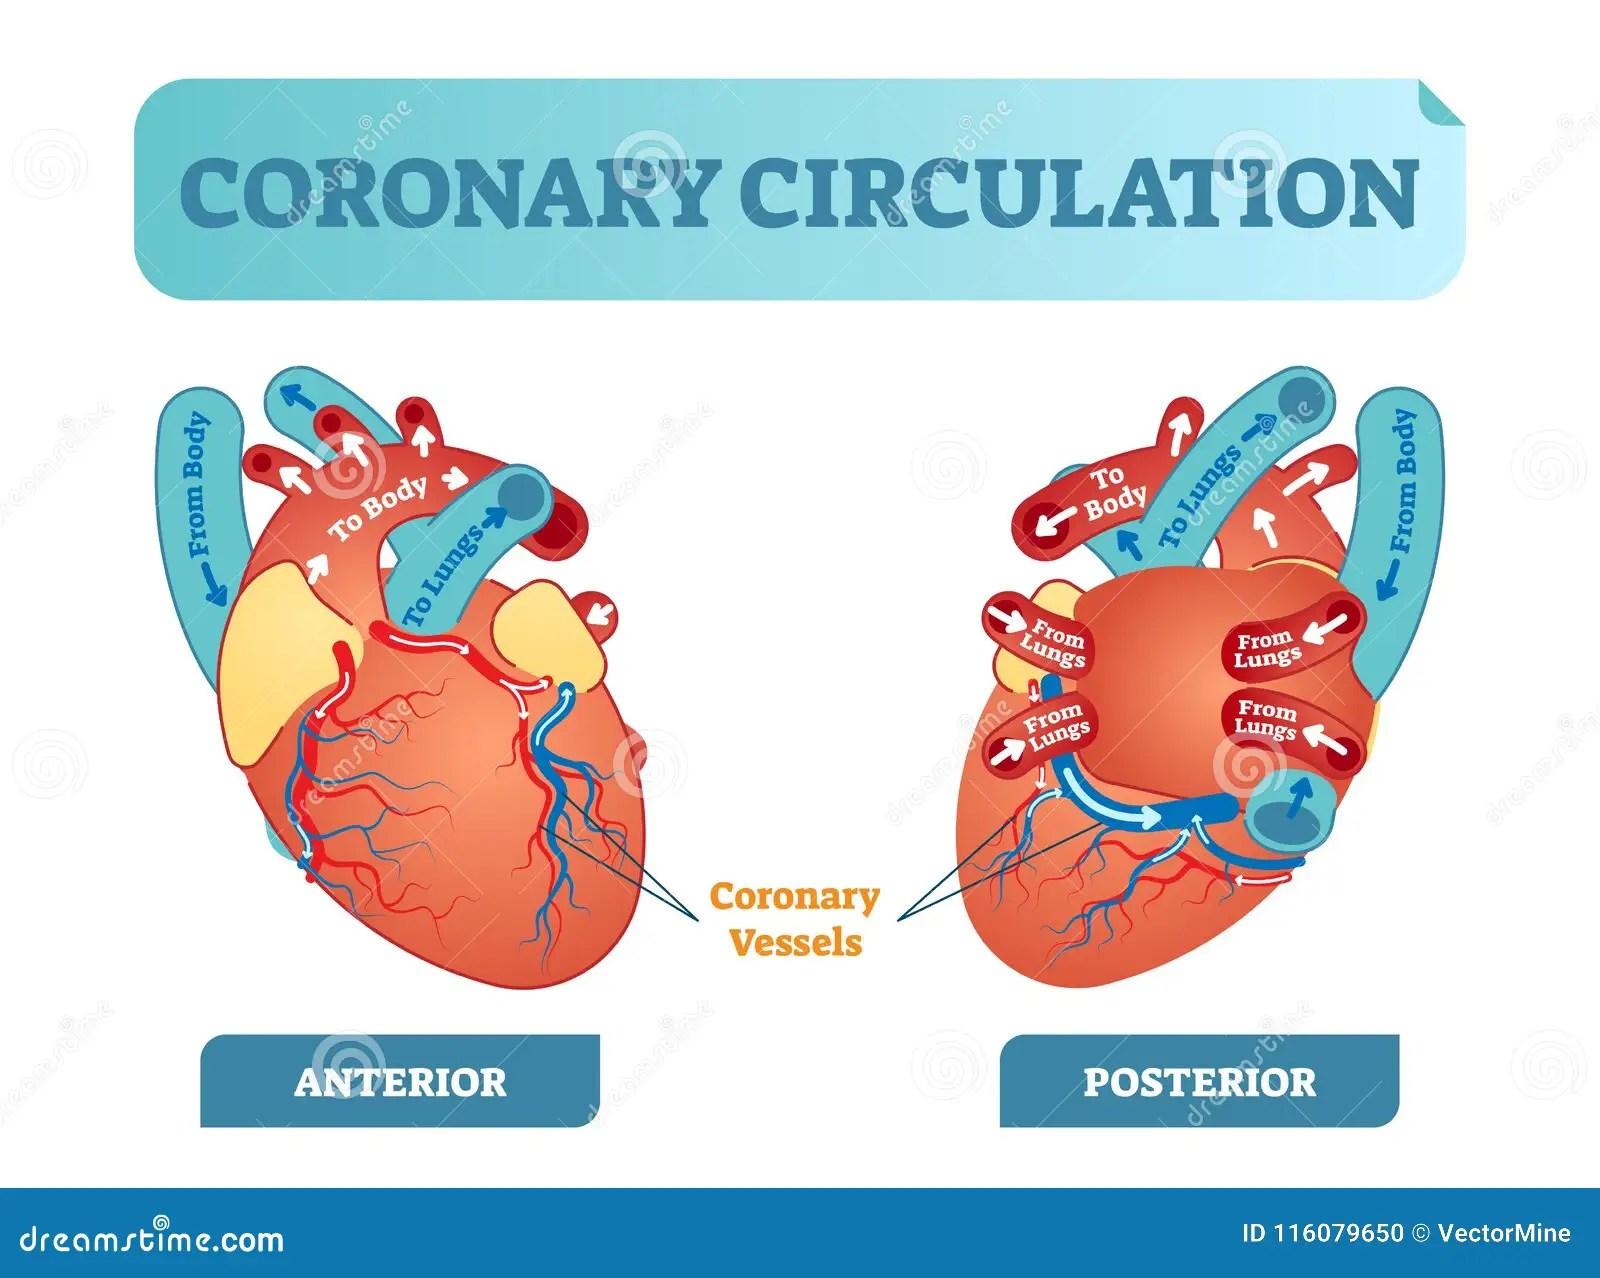 coronary anatomy diagram refrigerator wiring circulation cartoons illustrations and vector stock images